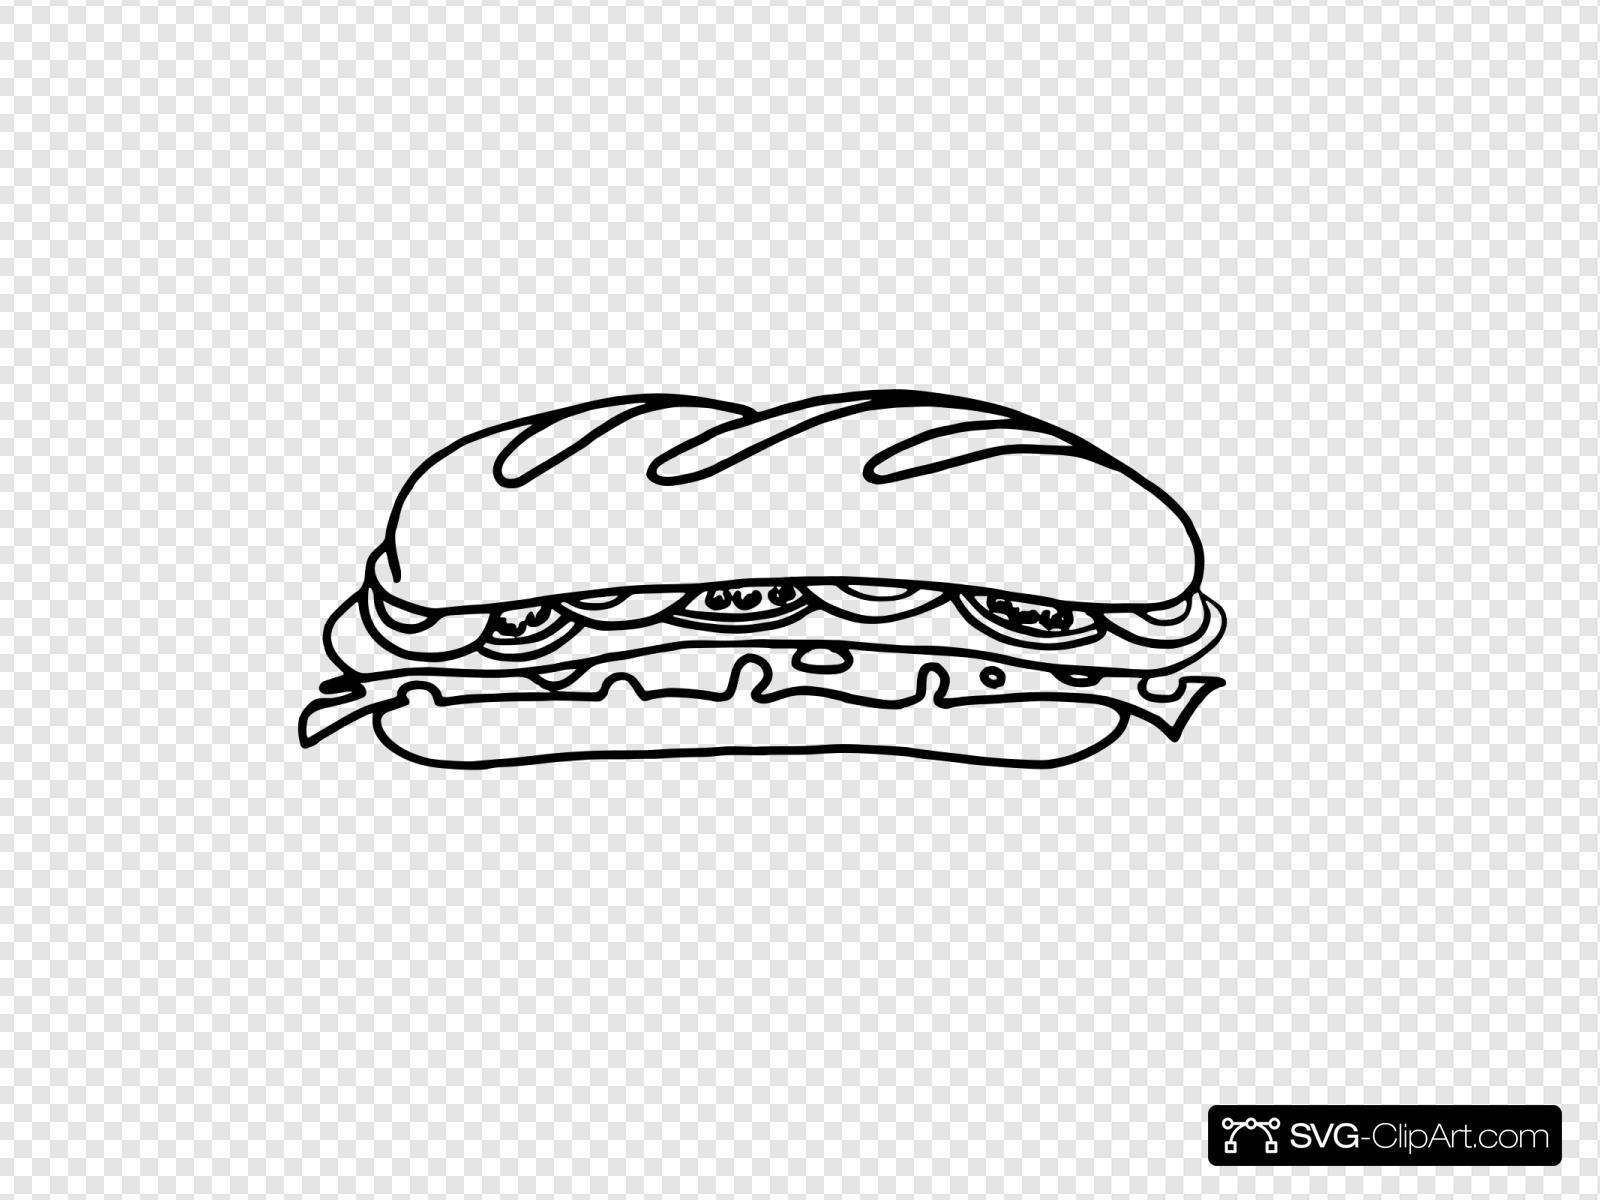 sandwich one bw svg vector sandwich one bw clip art svg clipart sandwich one bw clip art svg clipart